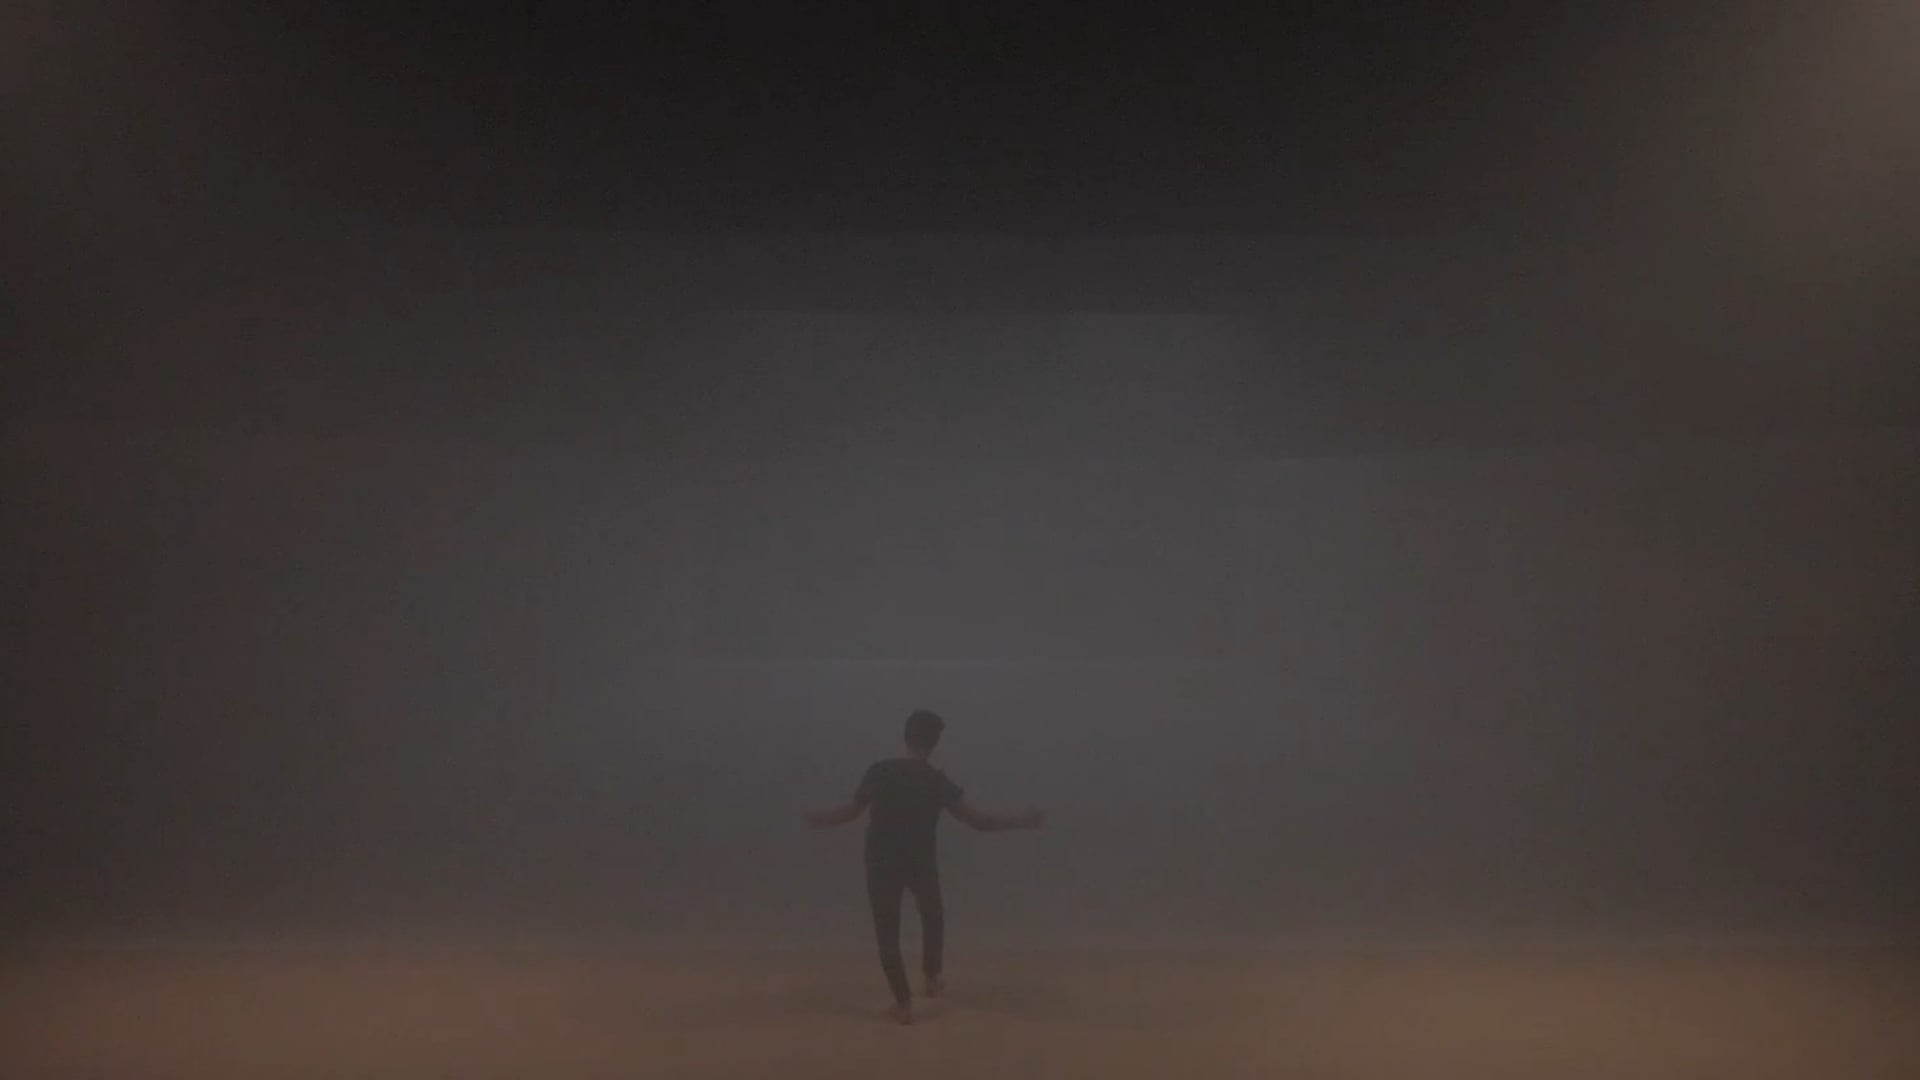 Cinq apparitions successives - Vincent Dupont - teaser